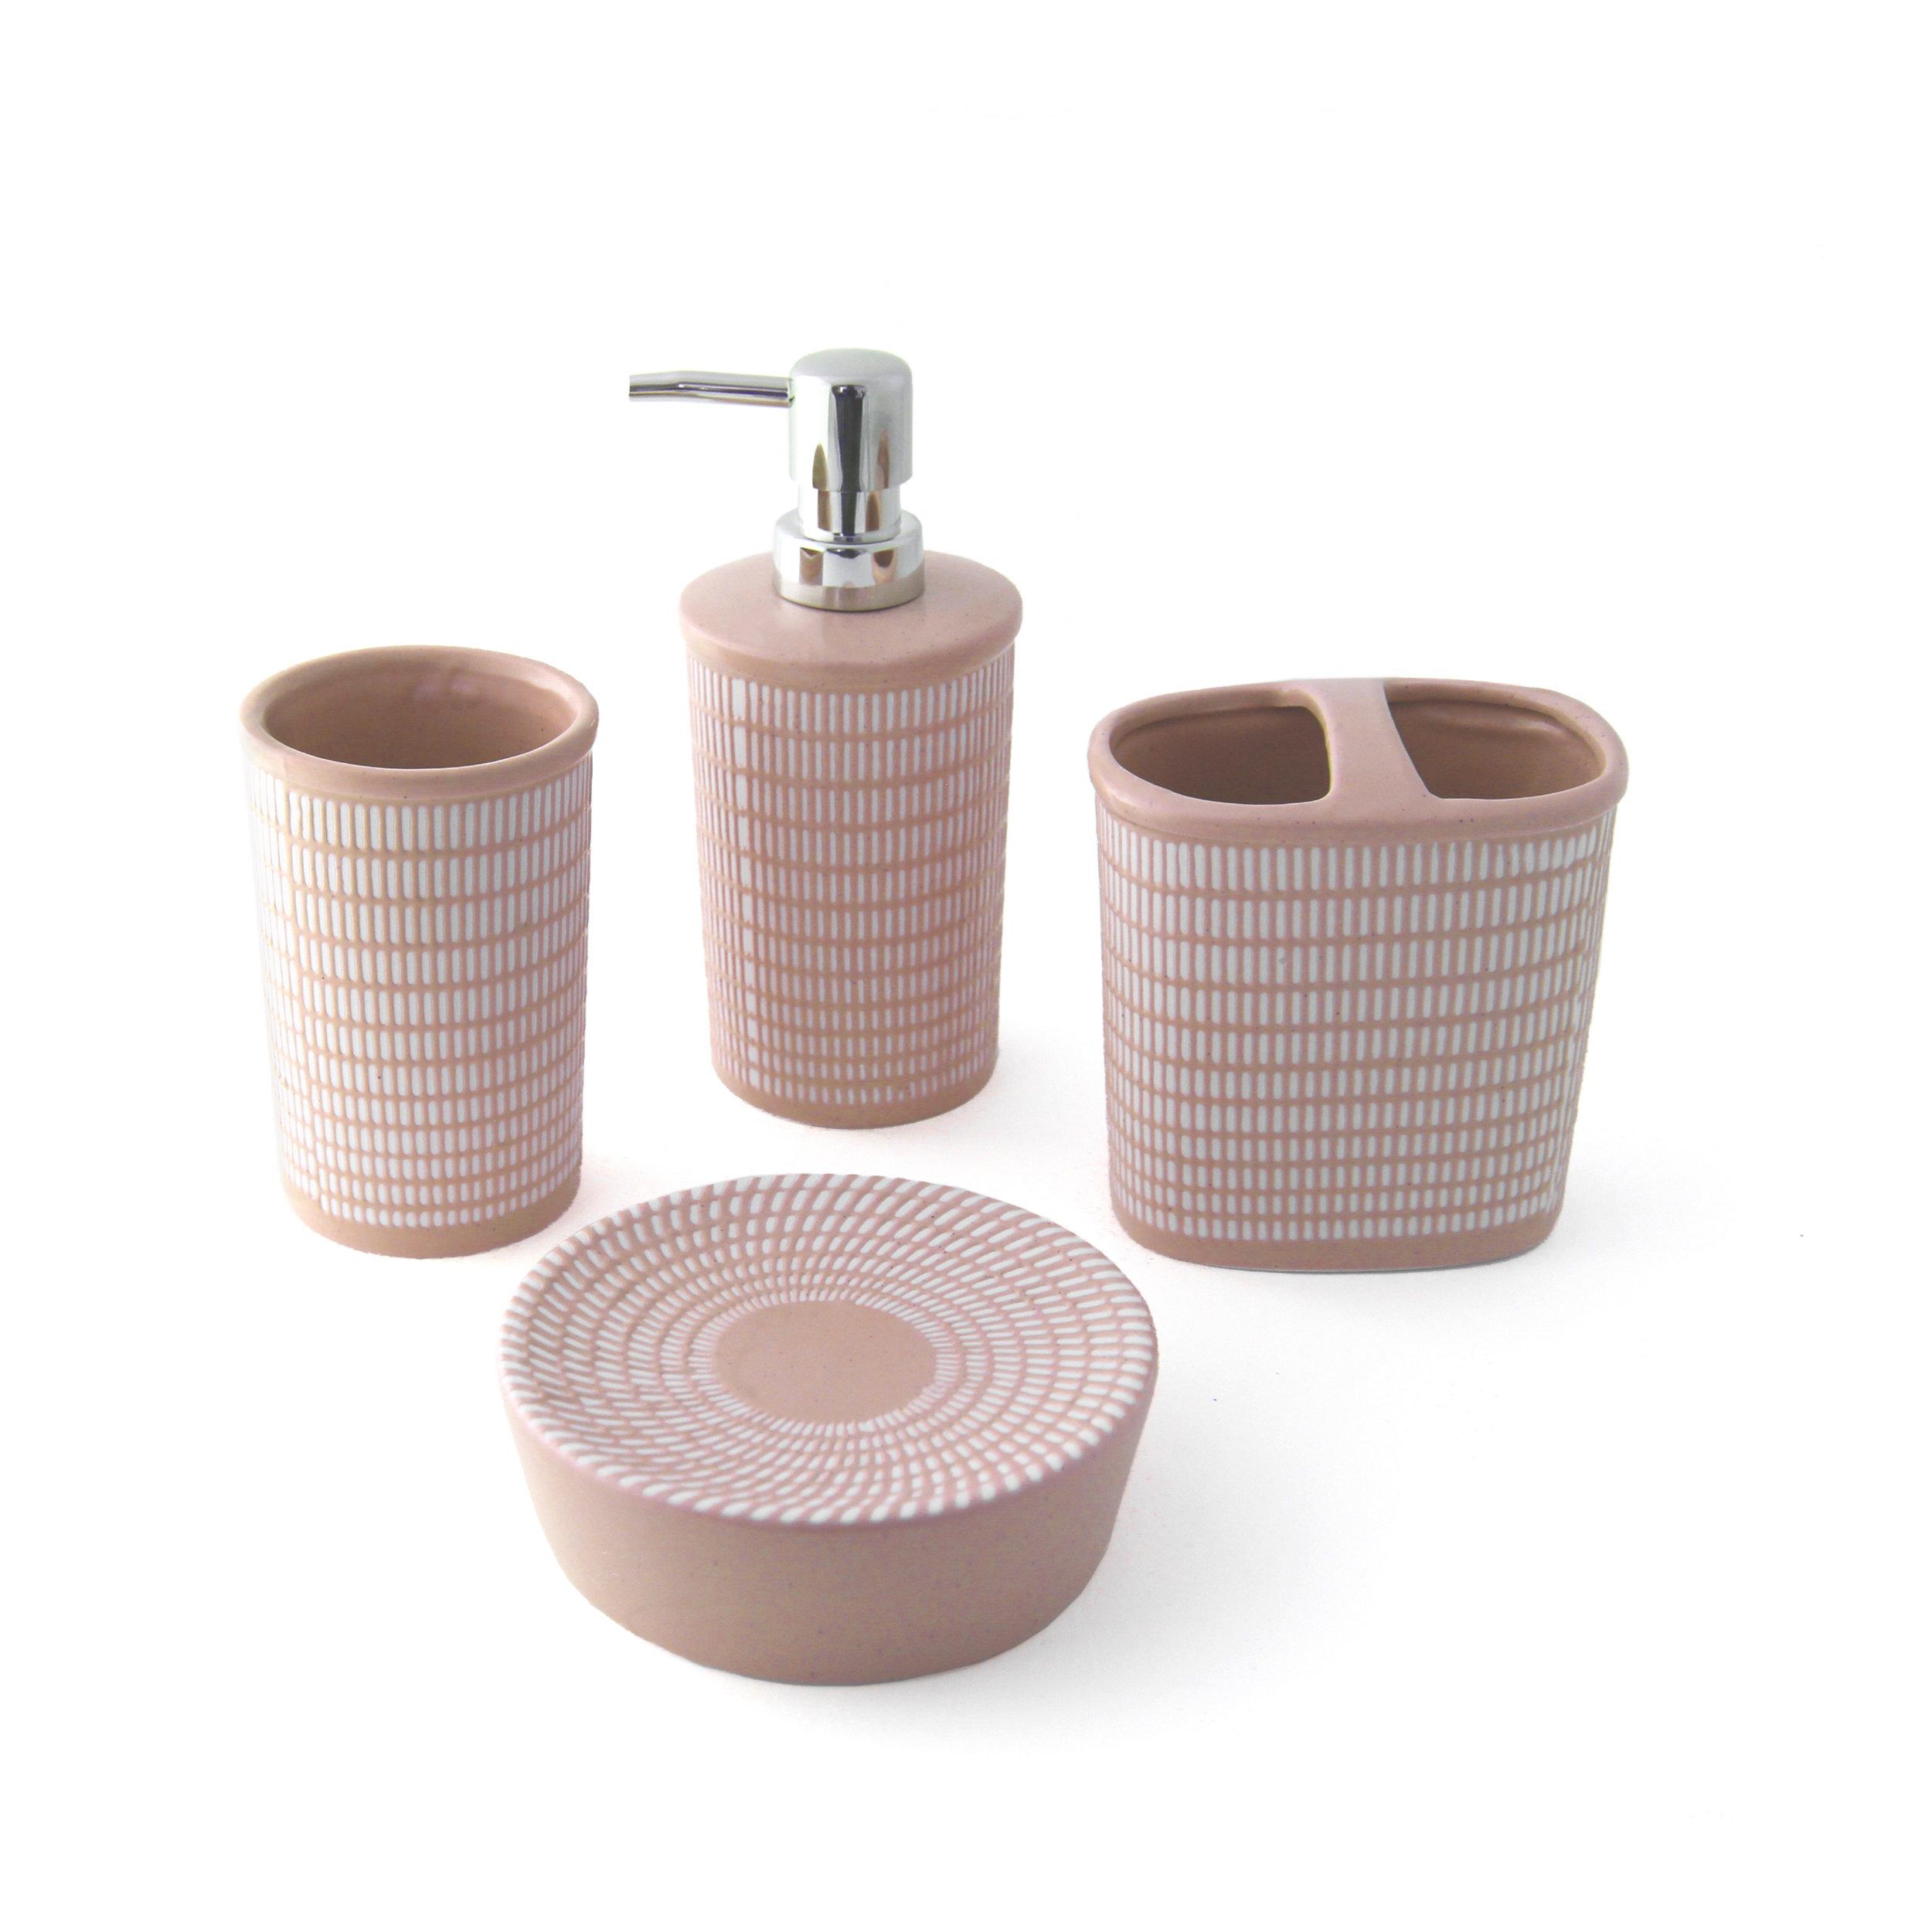 Anatolia ceramic accessory set